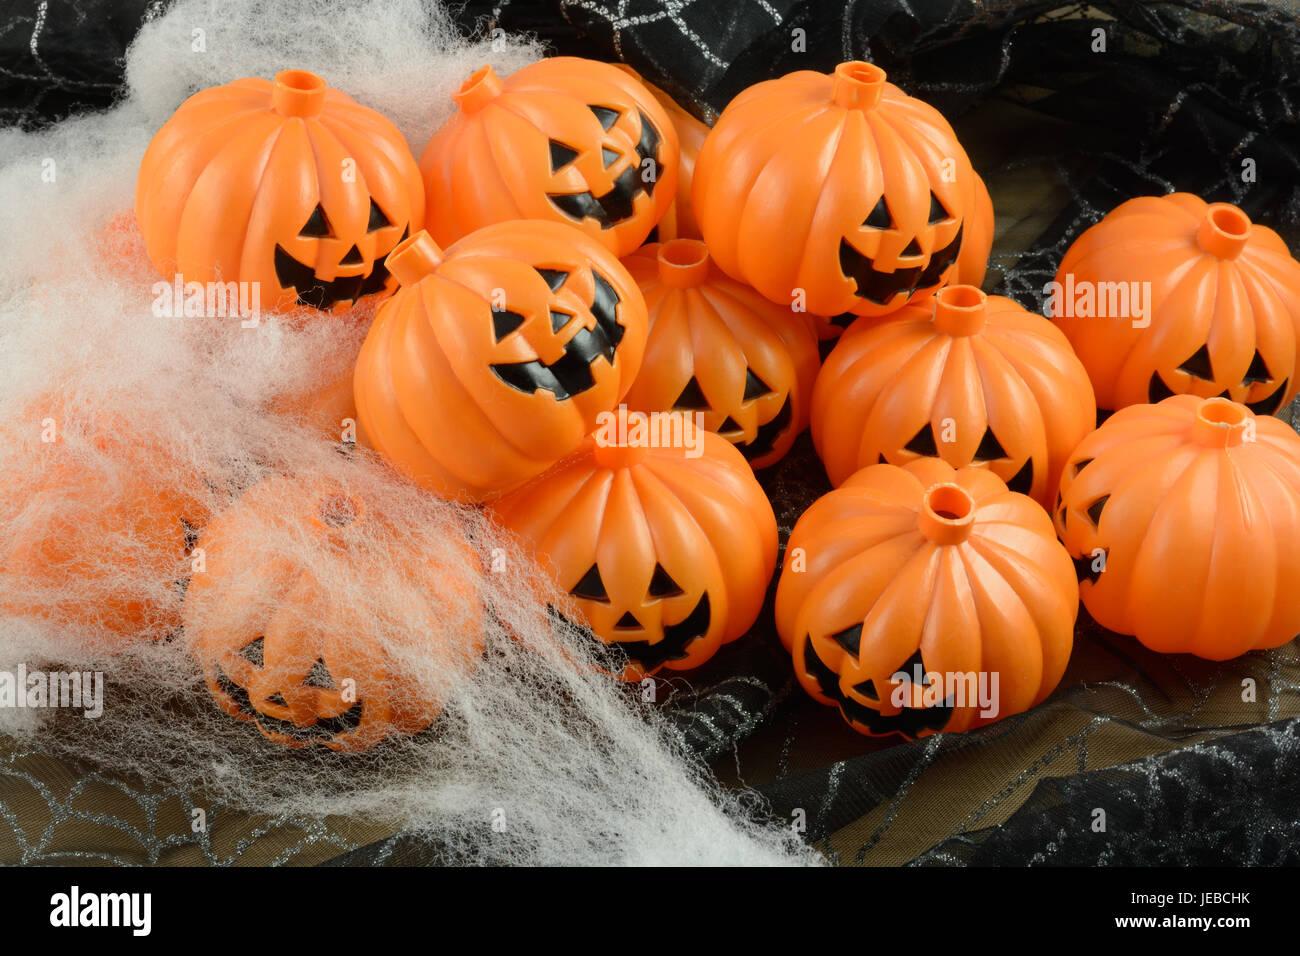 plastic jack o lanterns halloween decorations with spider cobweb decorations